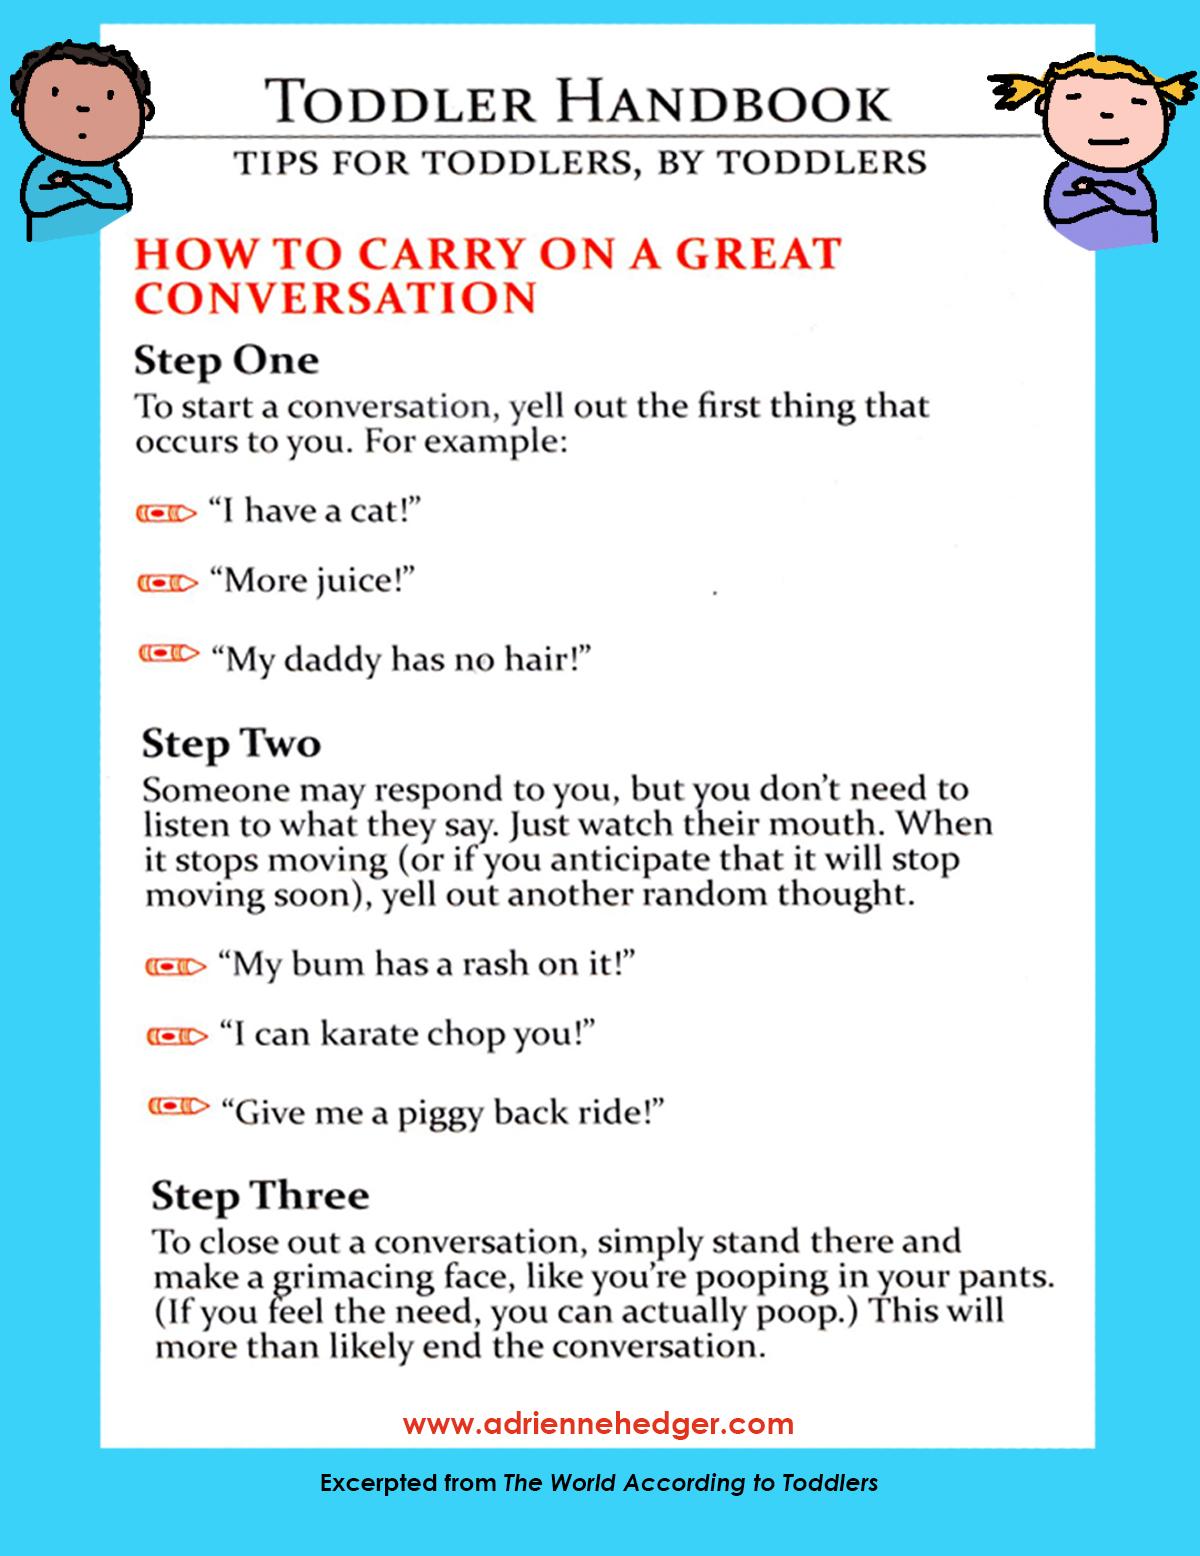 Toddler Handbook - Great Conversation